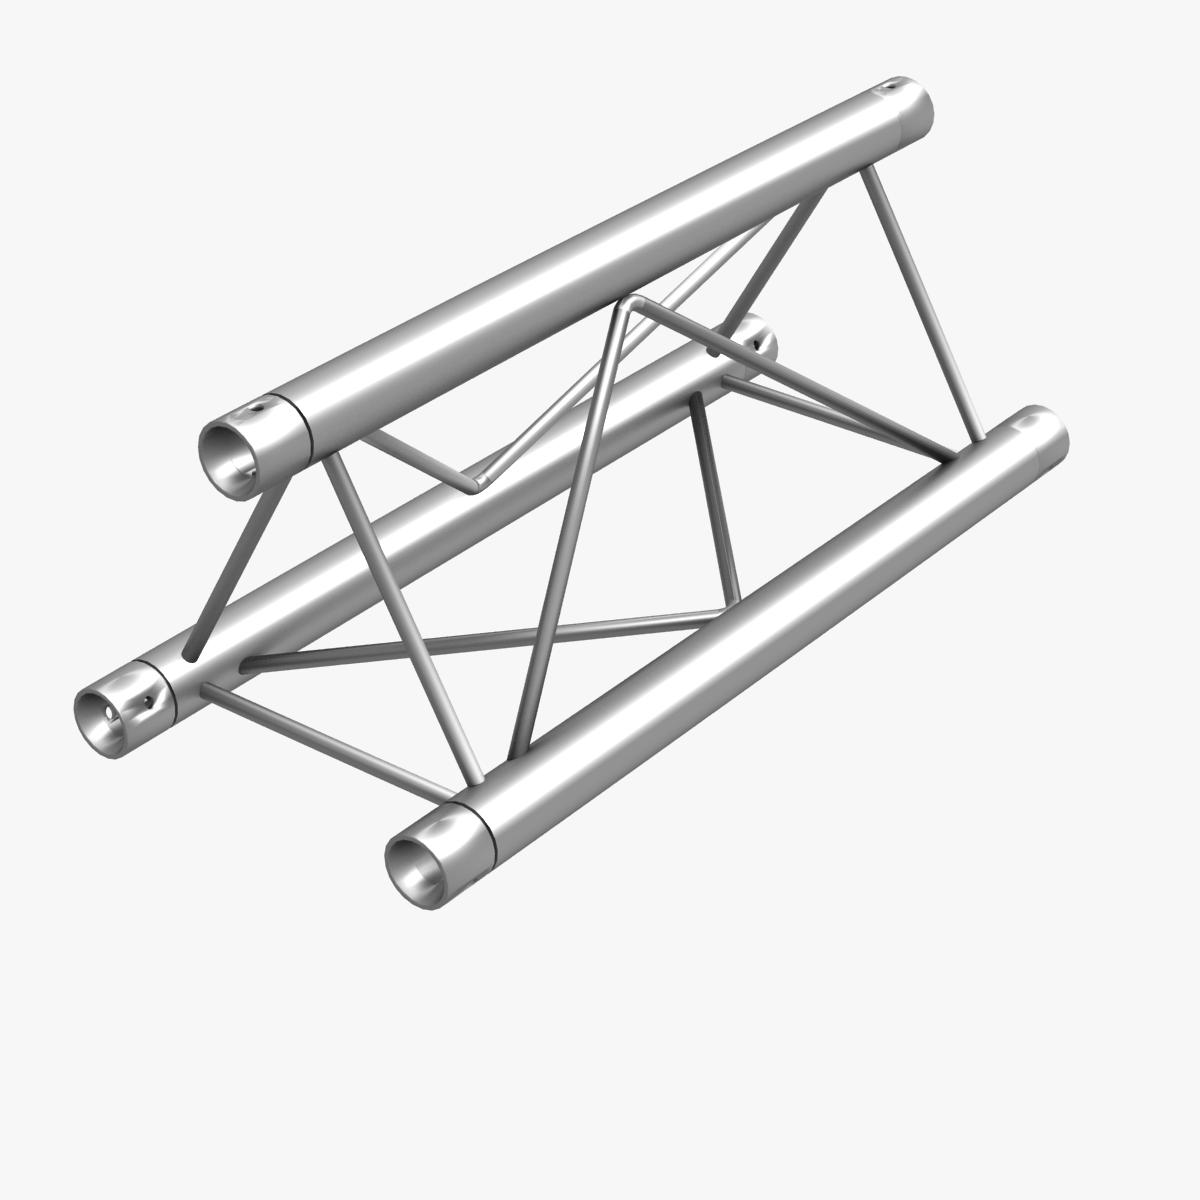 triangular trusses (collection 55 modular pieces) 3d model 3ds max dxf fbx c4d dae texture obj 216251